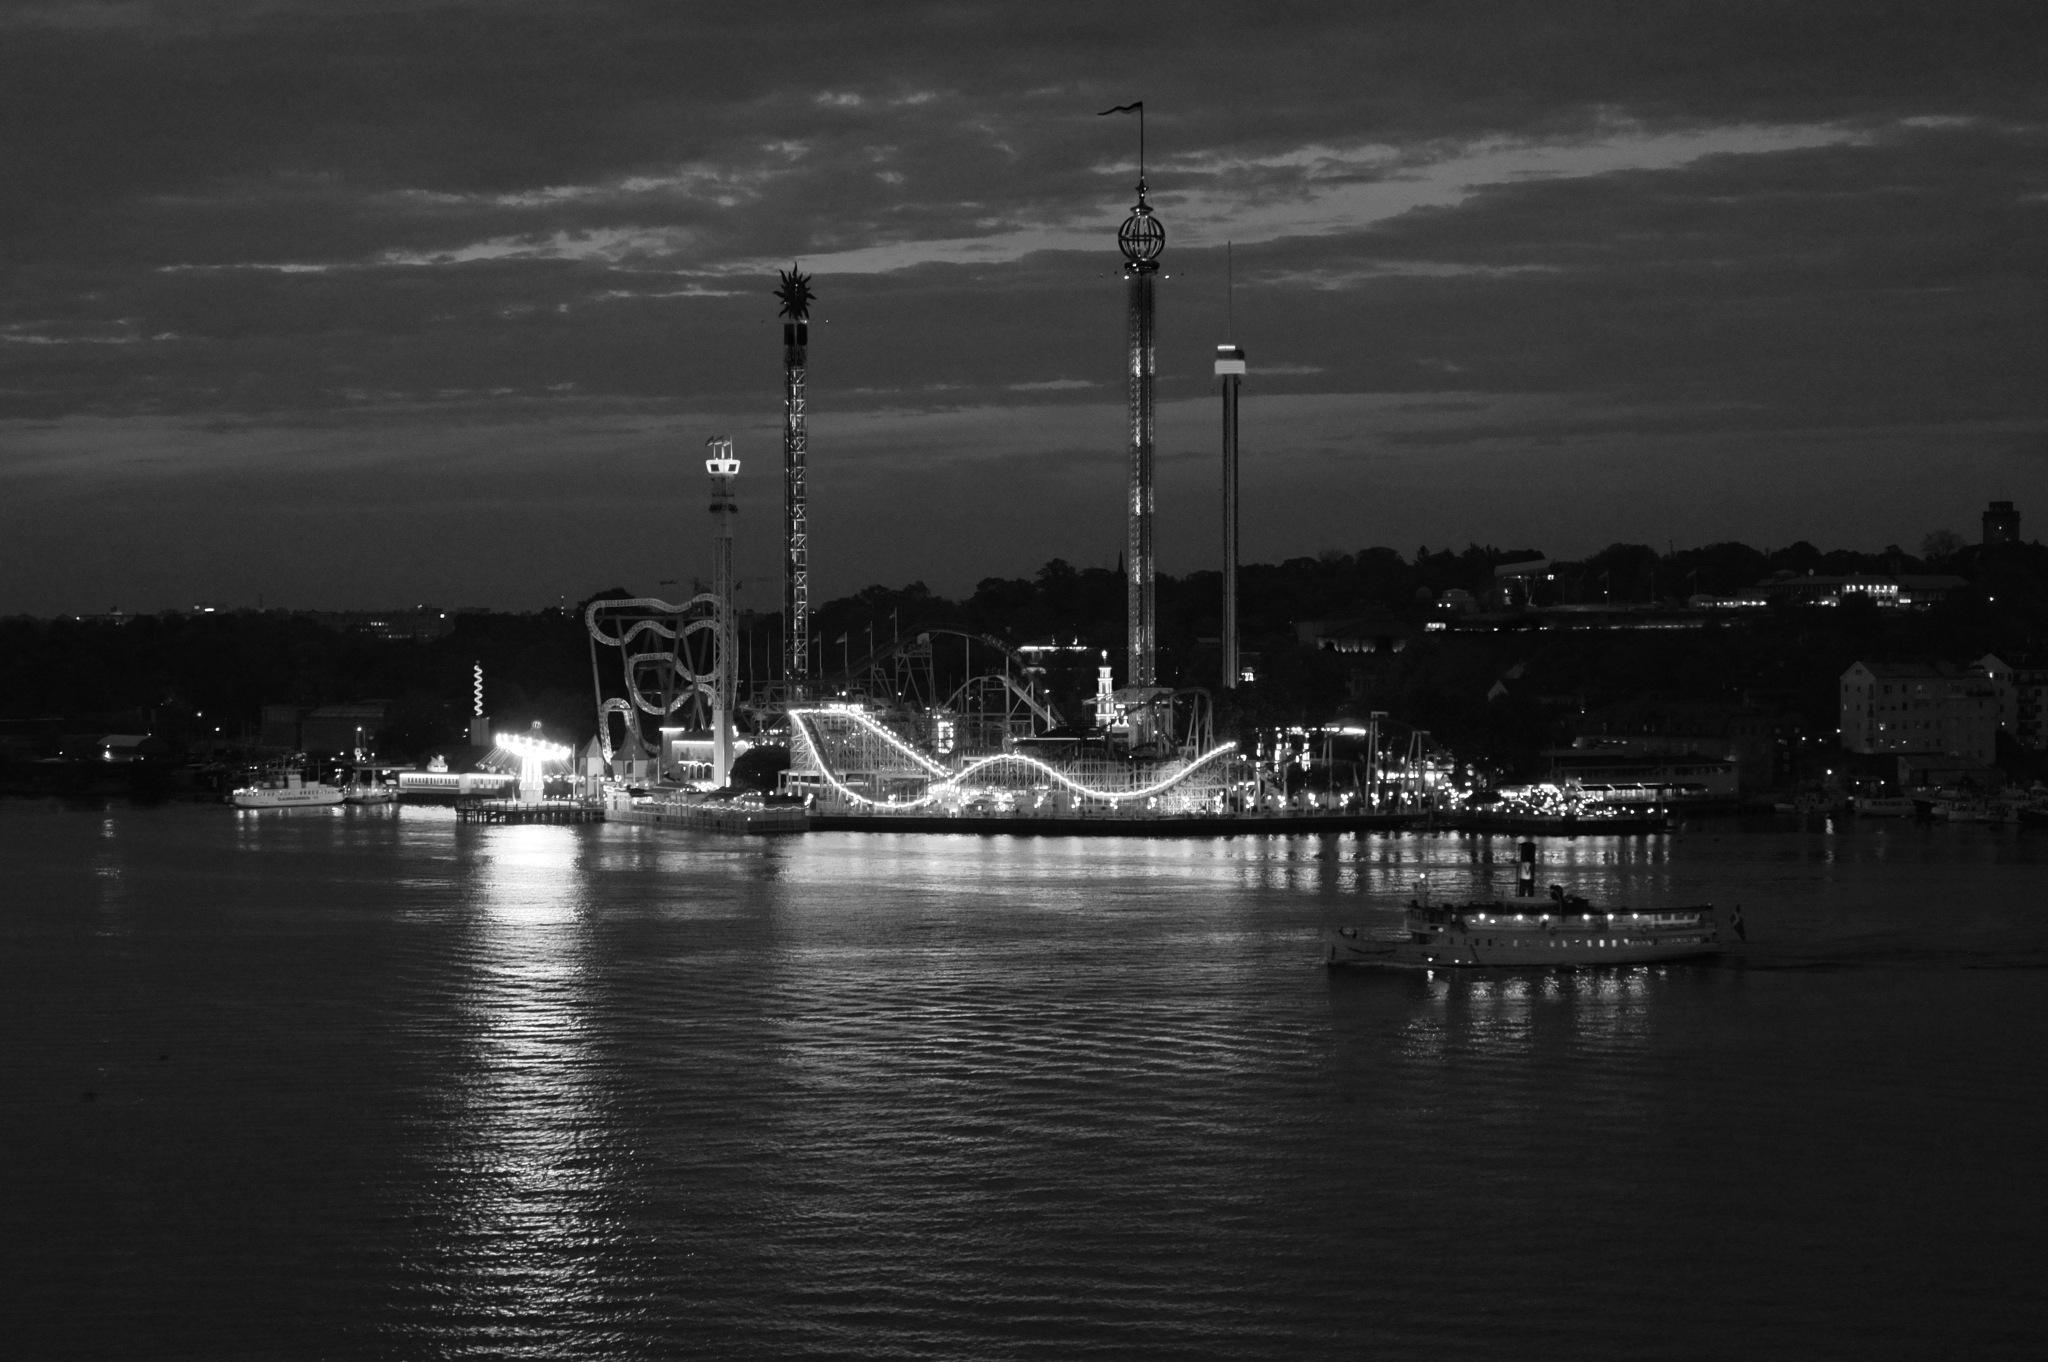 Tivoli Gröna Lund by Night, Stockholm by Annica Nykvist